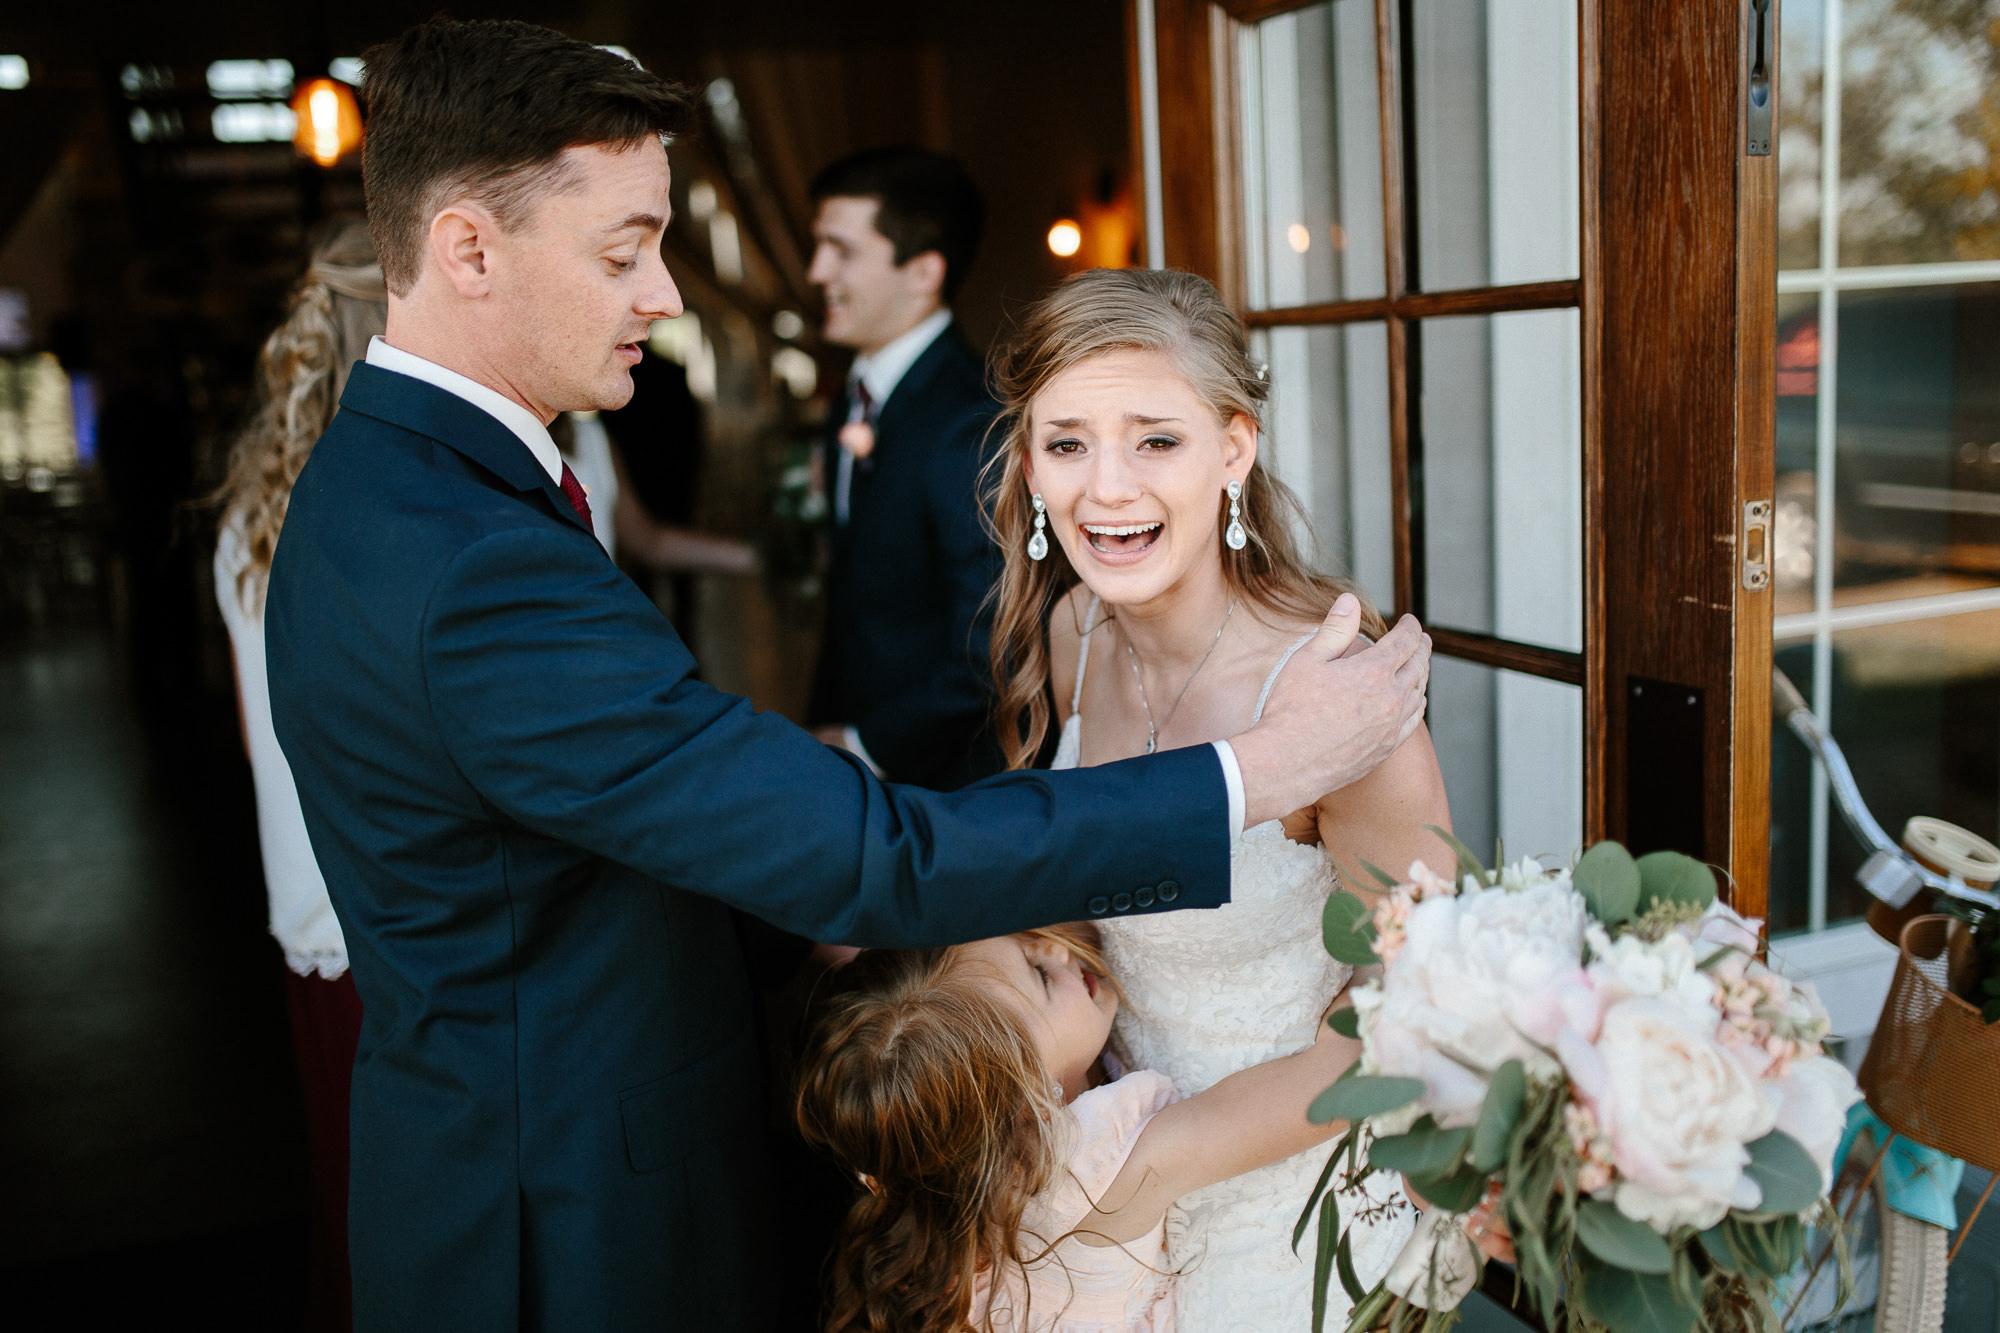 wedding-elopement-adventerous-romantic-timeless-south-dakota-blue-haven-barn-063.jpg